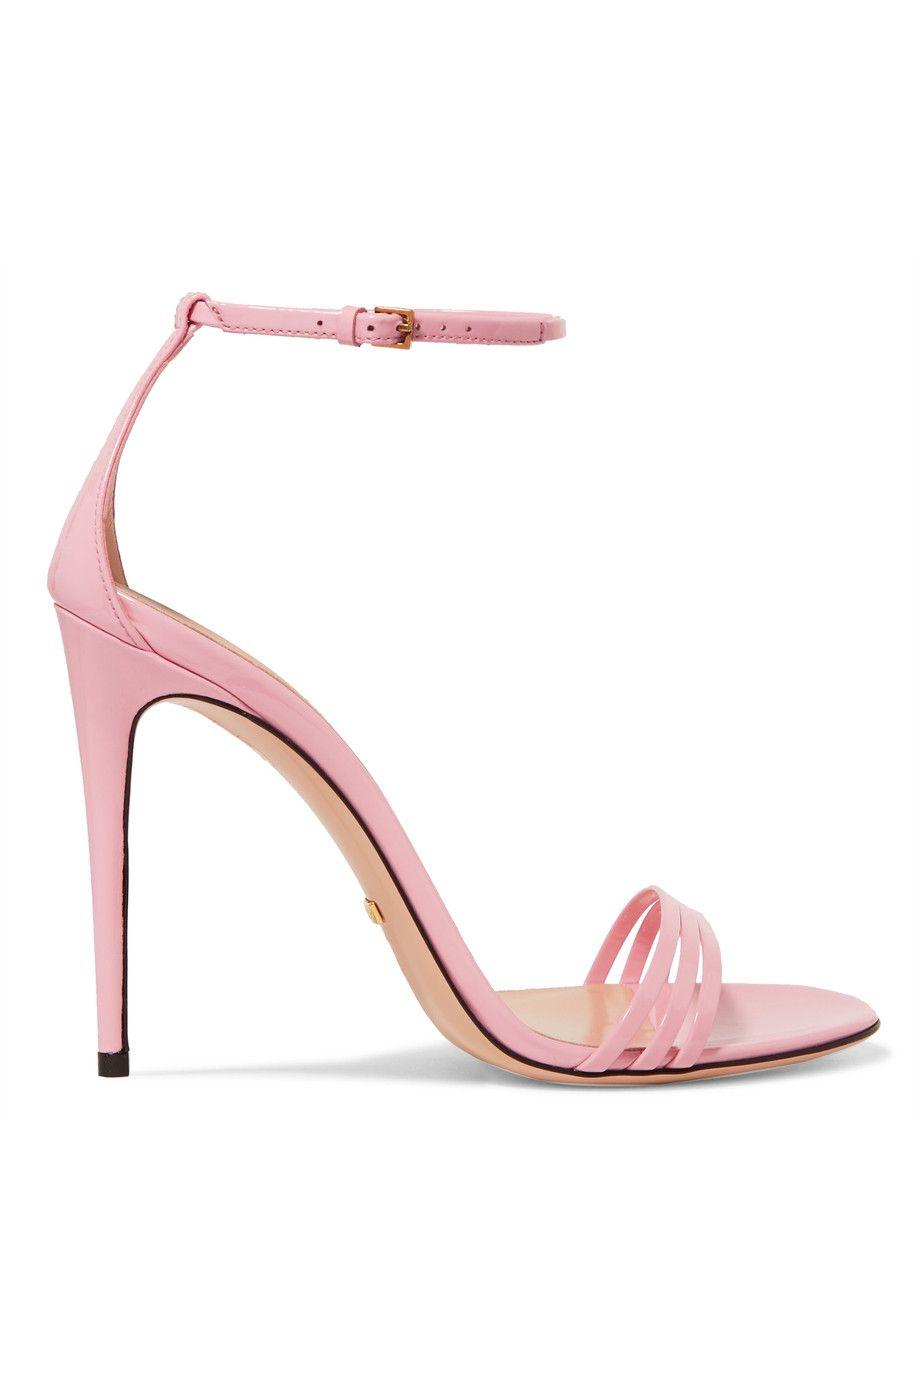 72a0b05c7 Gucci - Patent-leather sandals